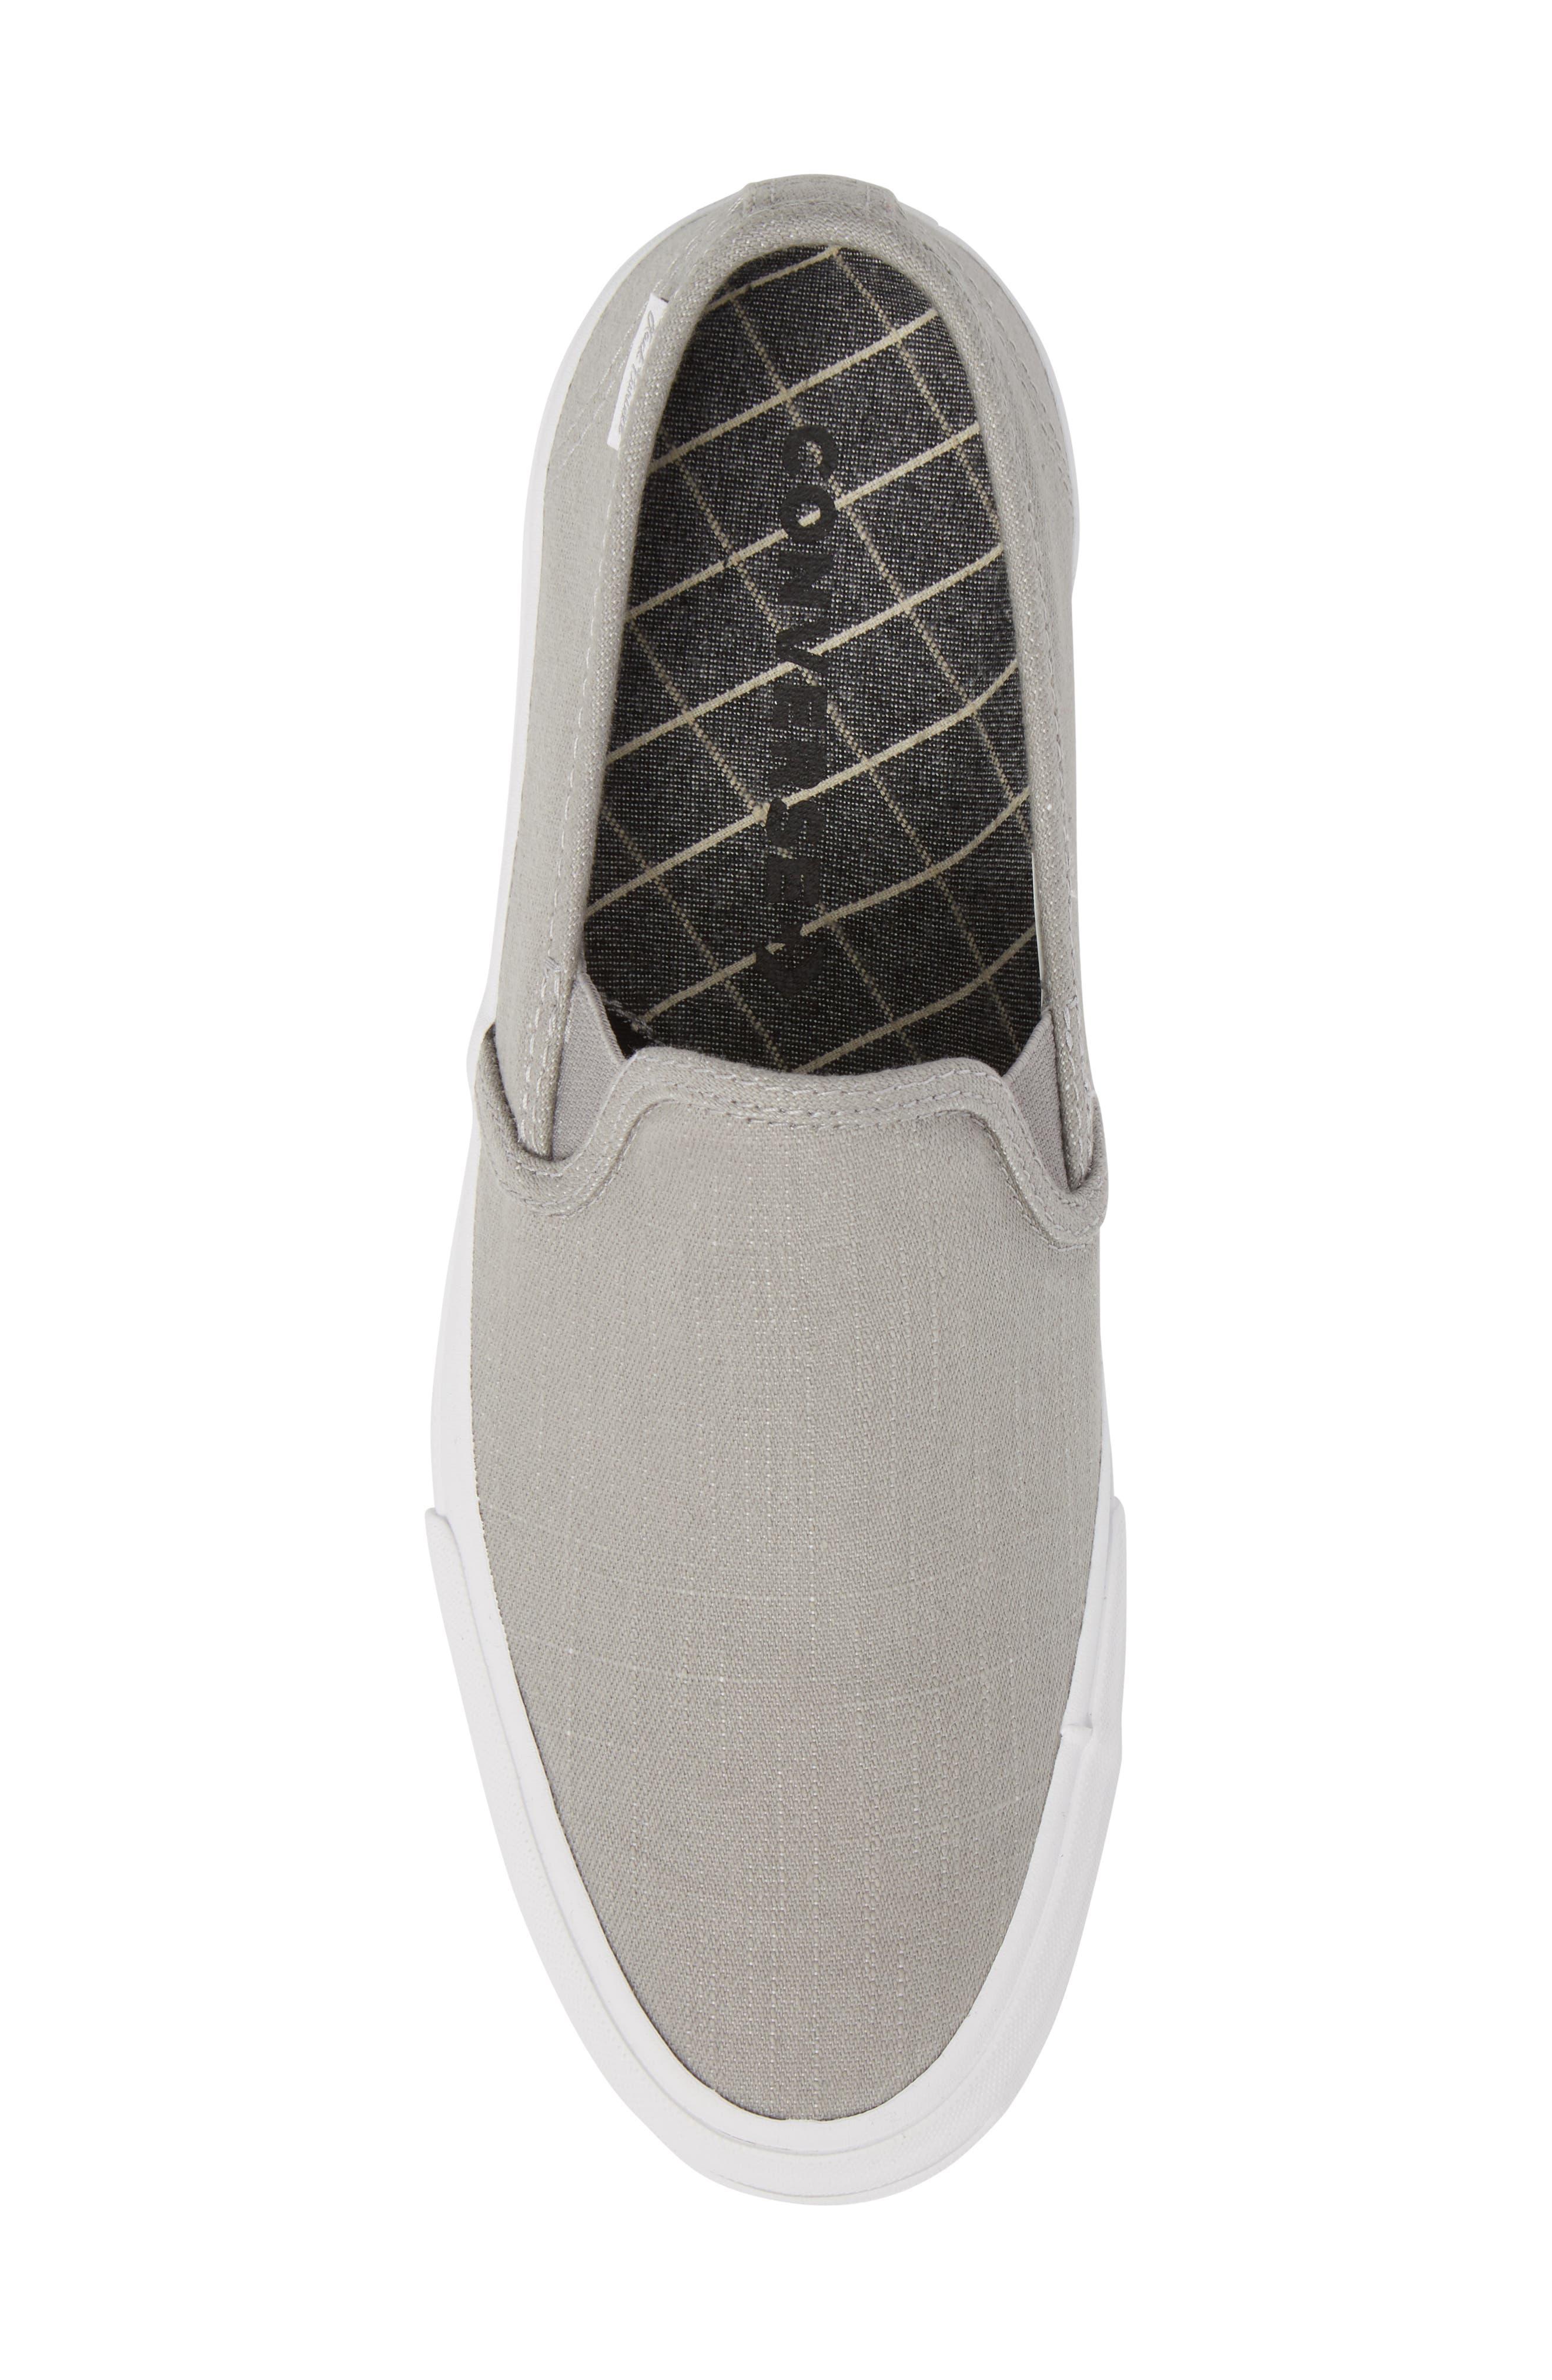 Jack Purcell Low Profile Slip-On Sneaker,                             Alternate thumbnail 5, color,                             020